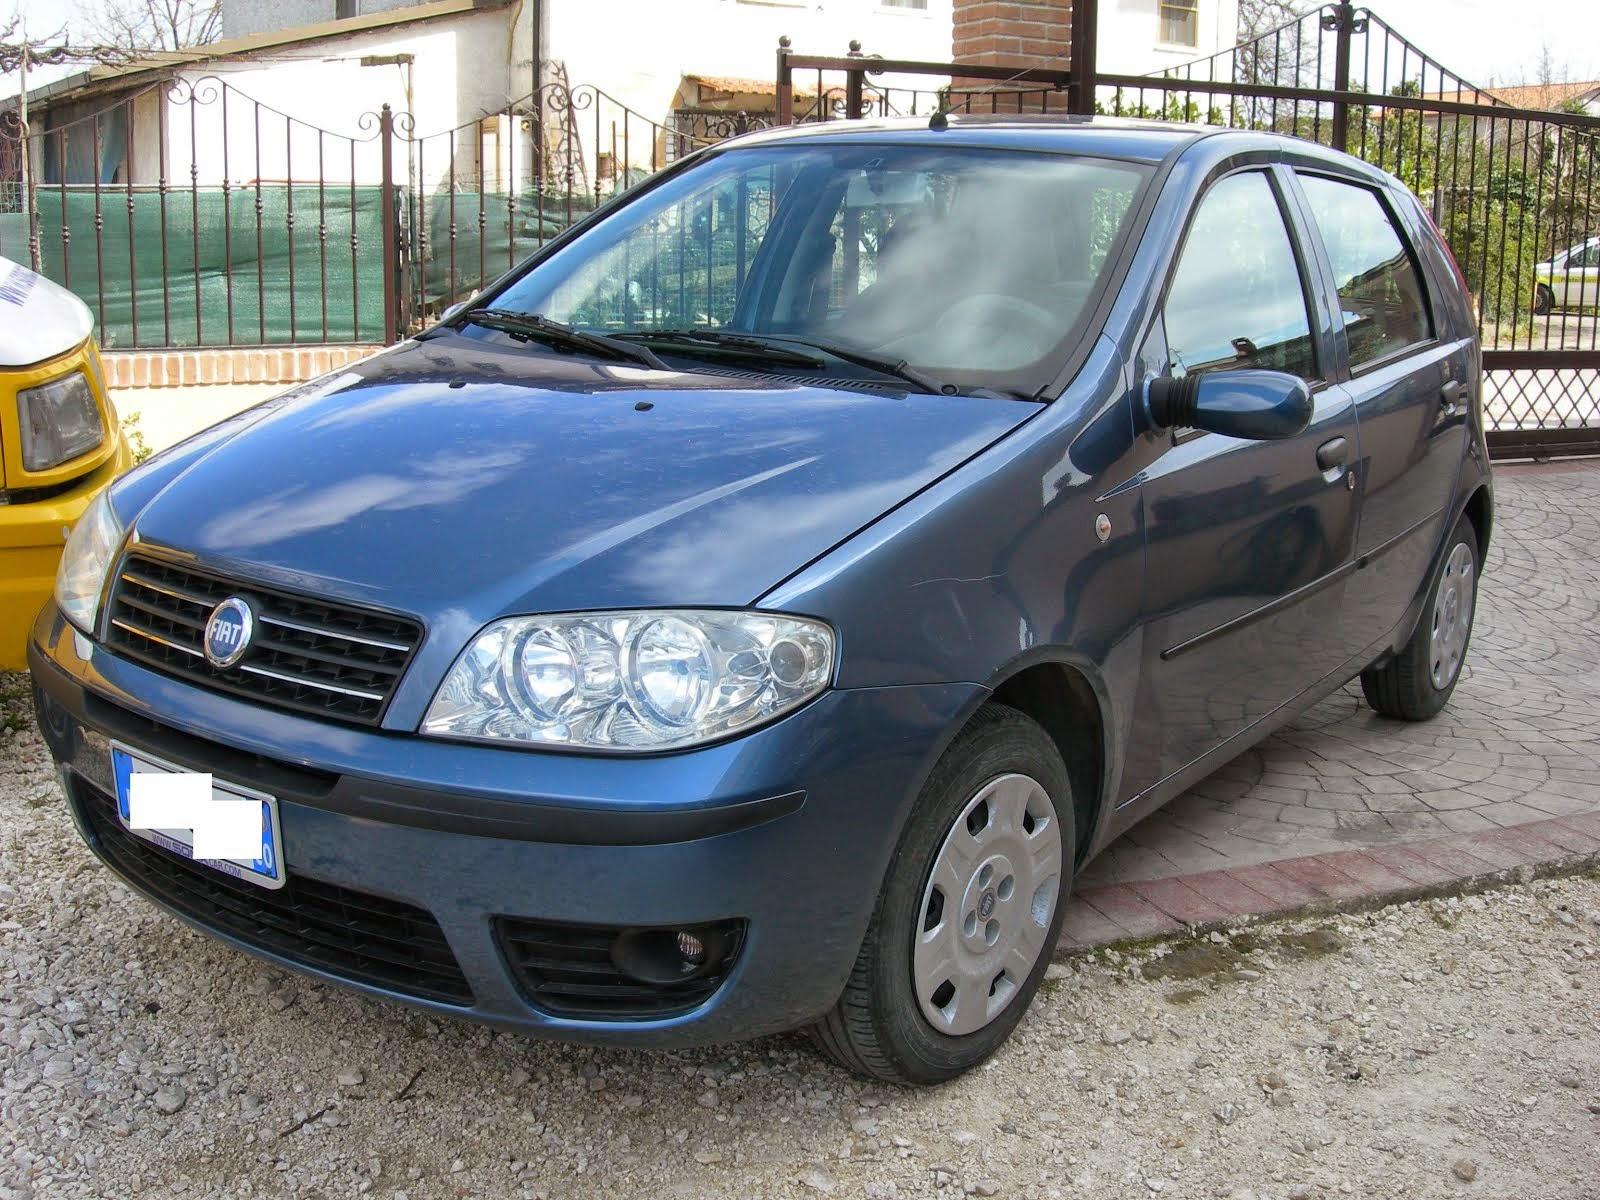 Fiat Punto 1.2 Anno 2004 100.000 km mod.Dinamyc